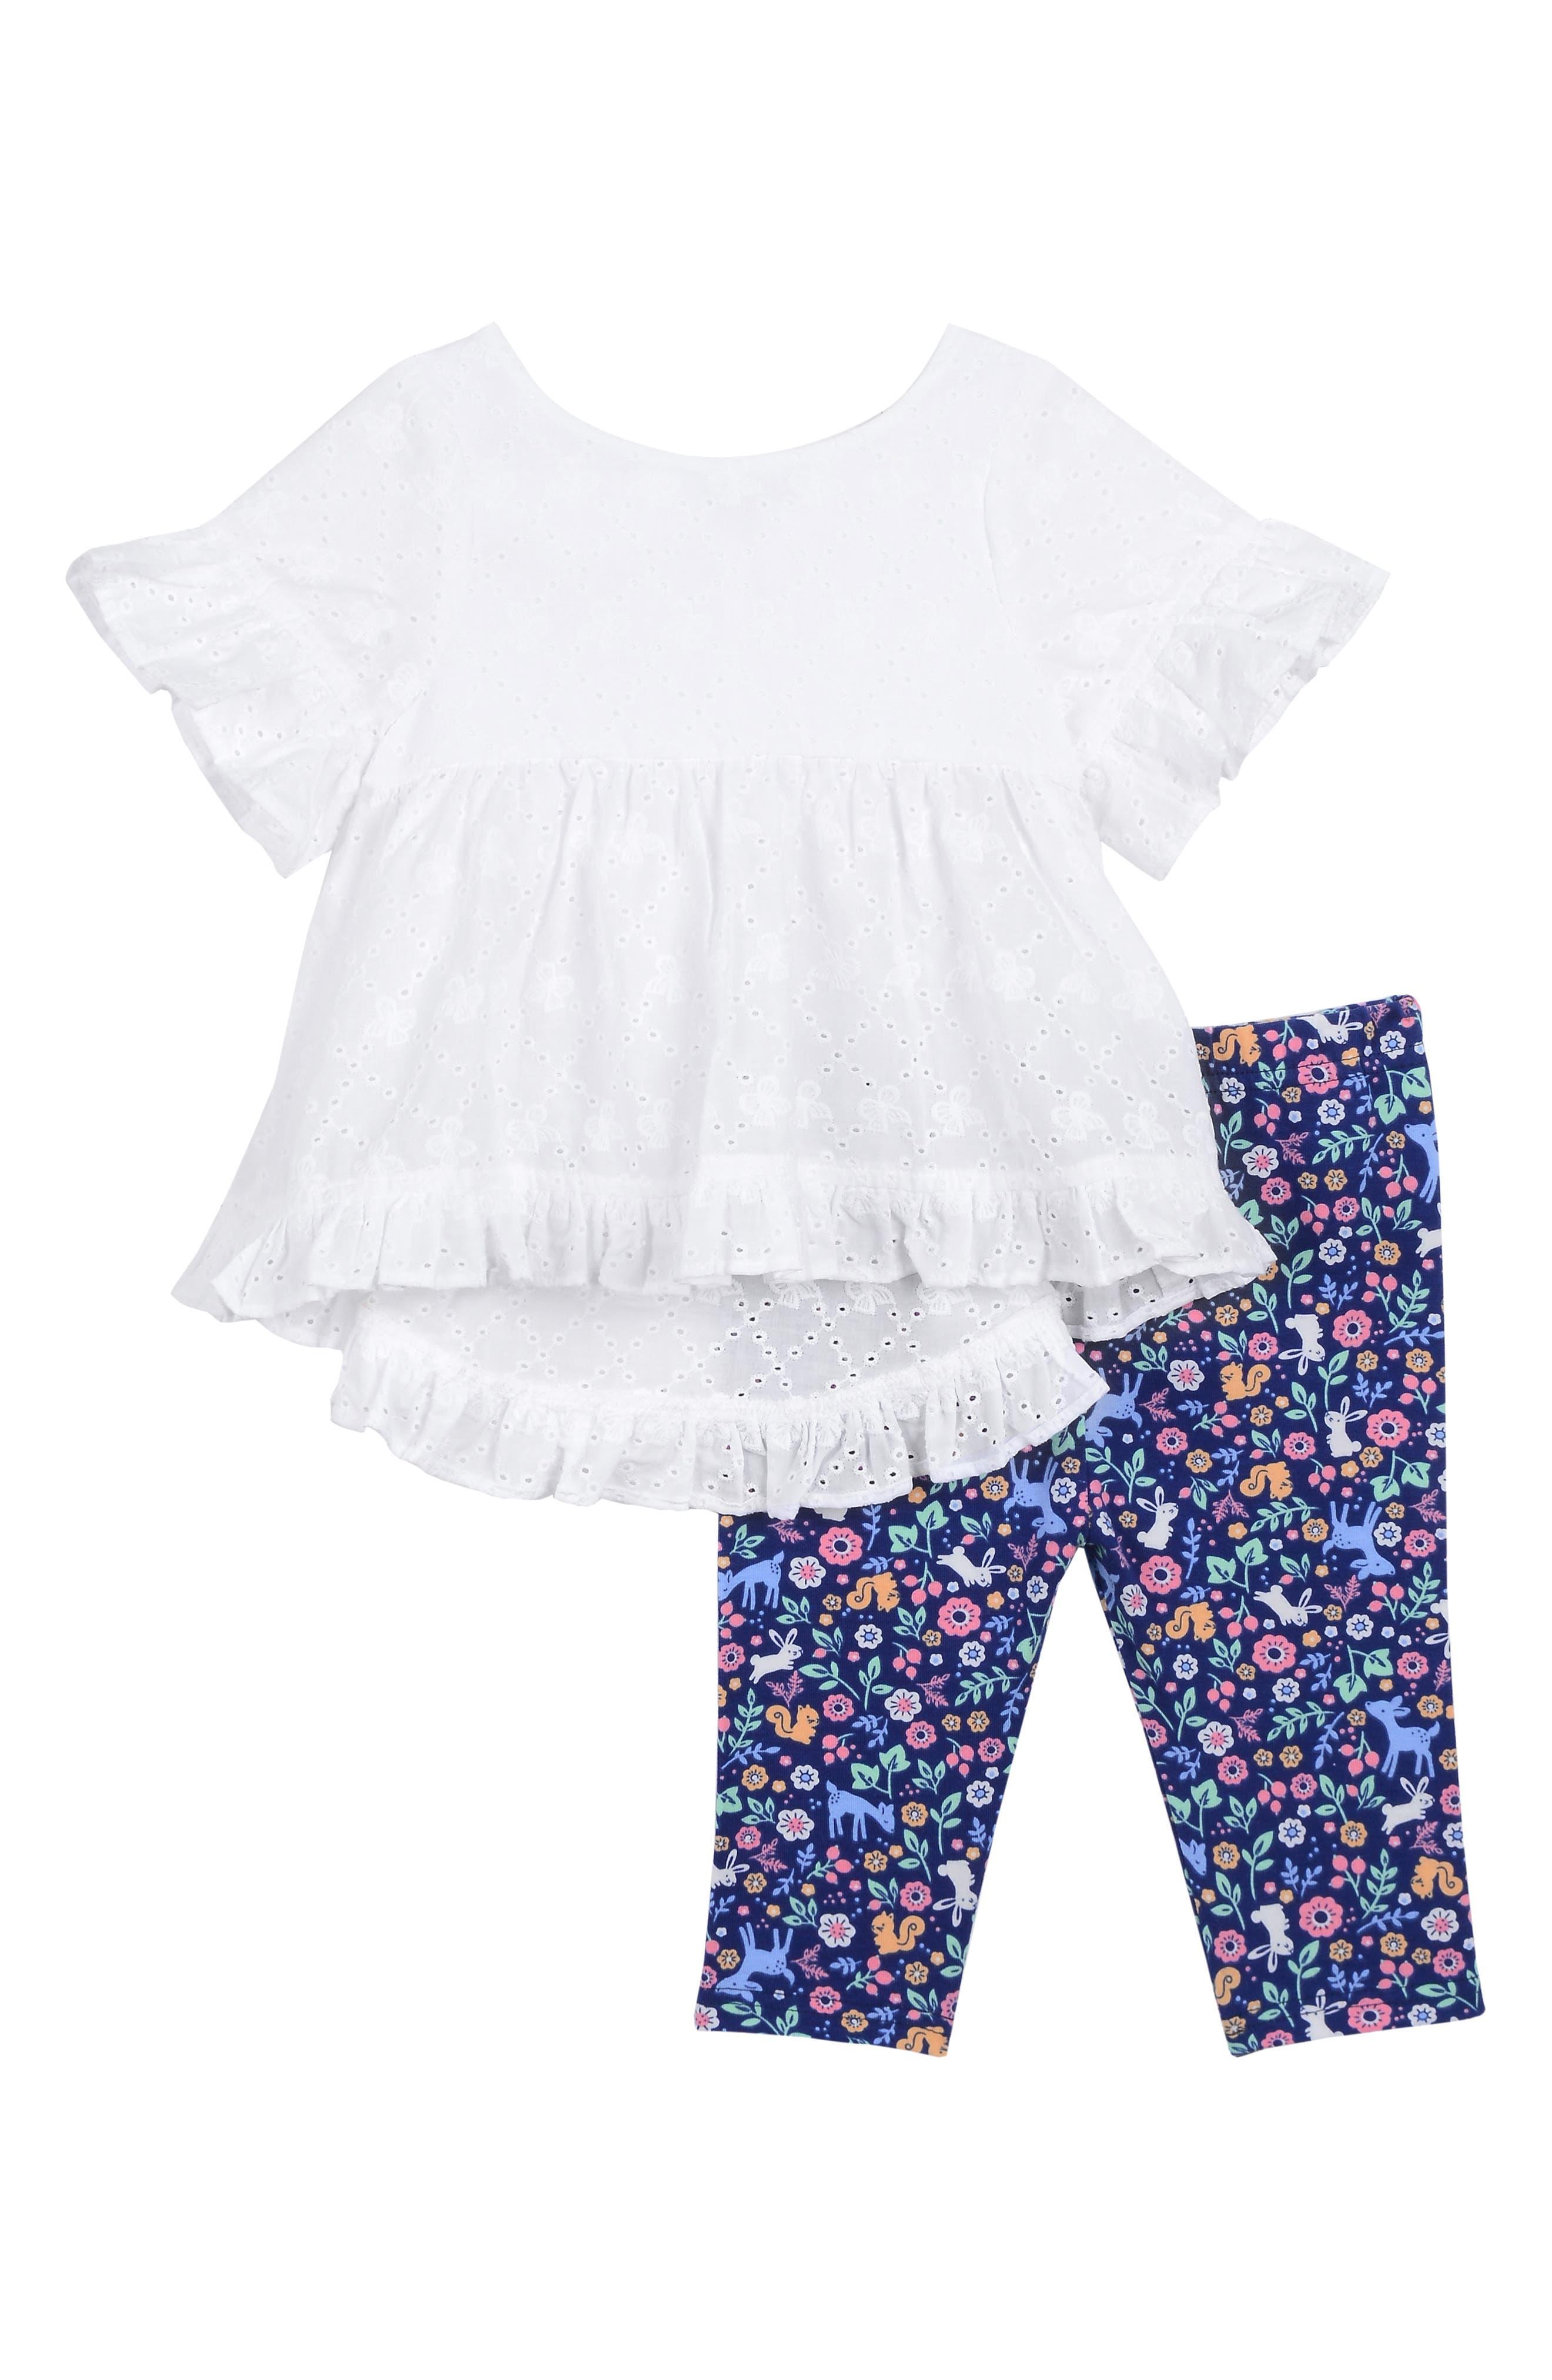 PASTOURELLE BY PIPPA & JULIE, Eyelet Ruffle Top & Floral Leggings Set, Main thumbnail 1, color, WHITE